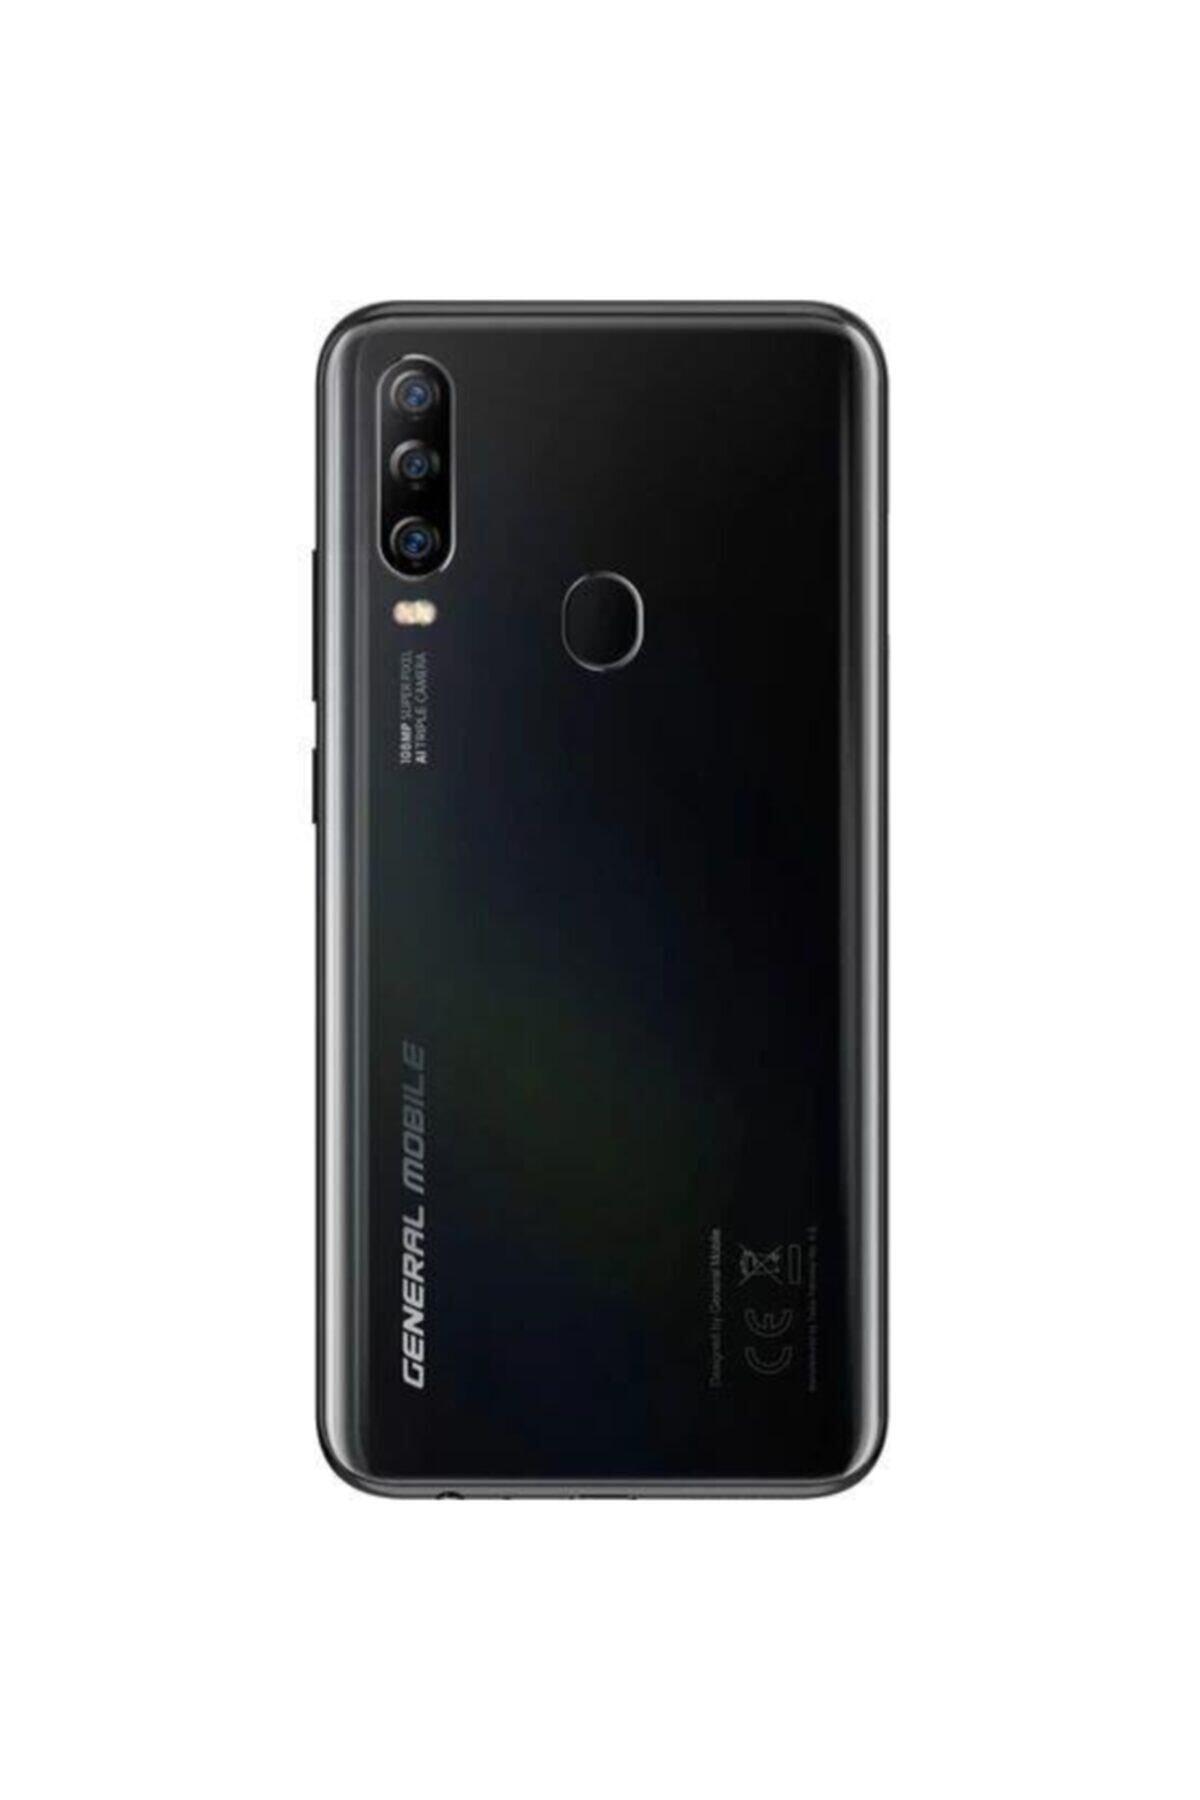 General Mobile Gm 20 Pro Dual 128GB Siyah Cep Telefonu (Türkiye Garantilidir)